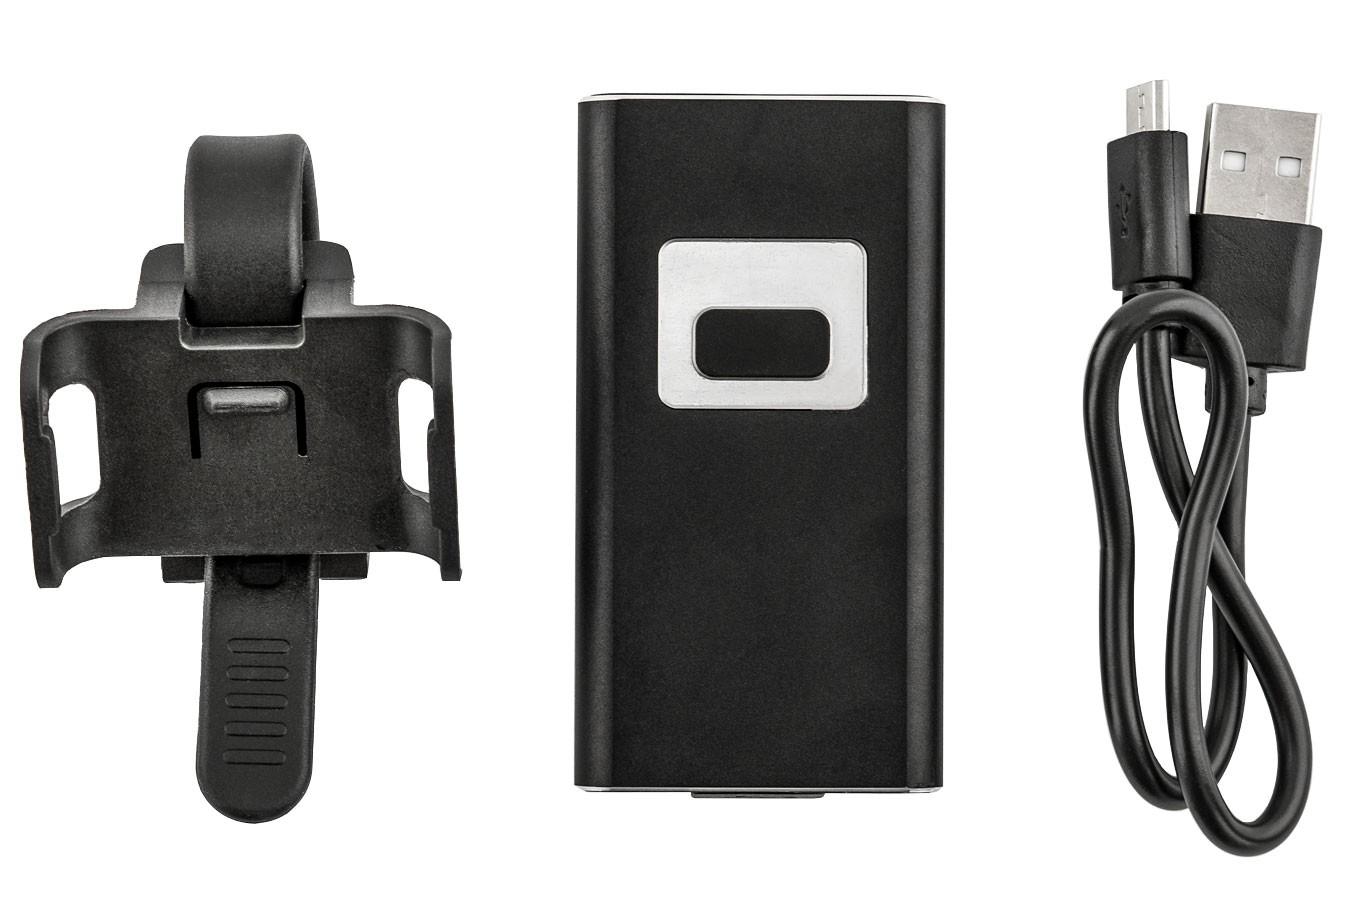 Farol recarregável USB 500 lúmens 2 LEDs